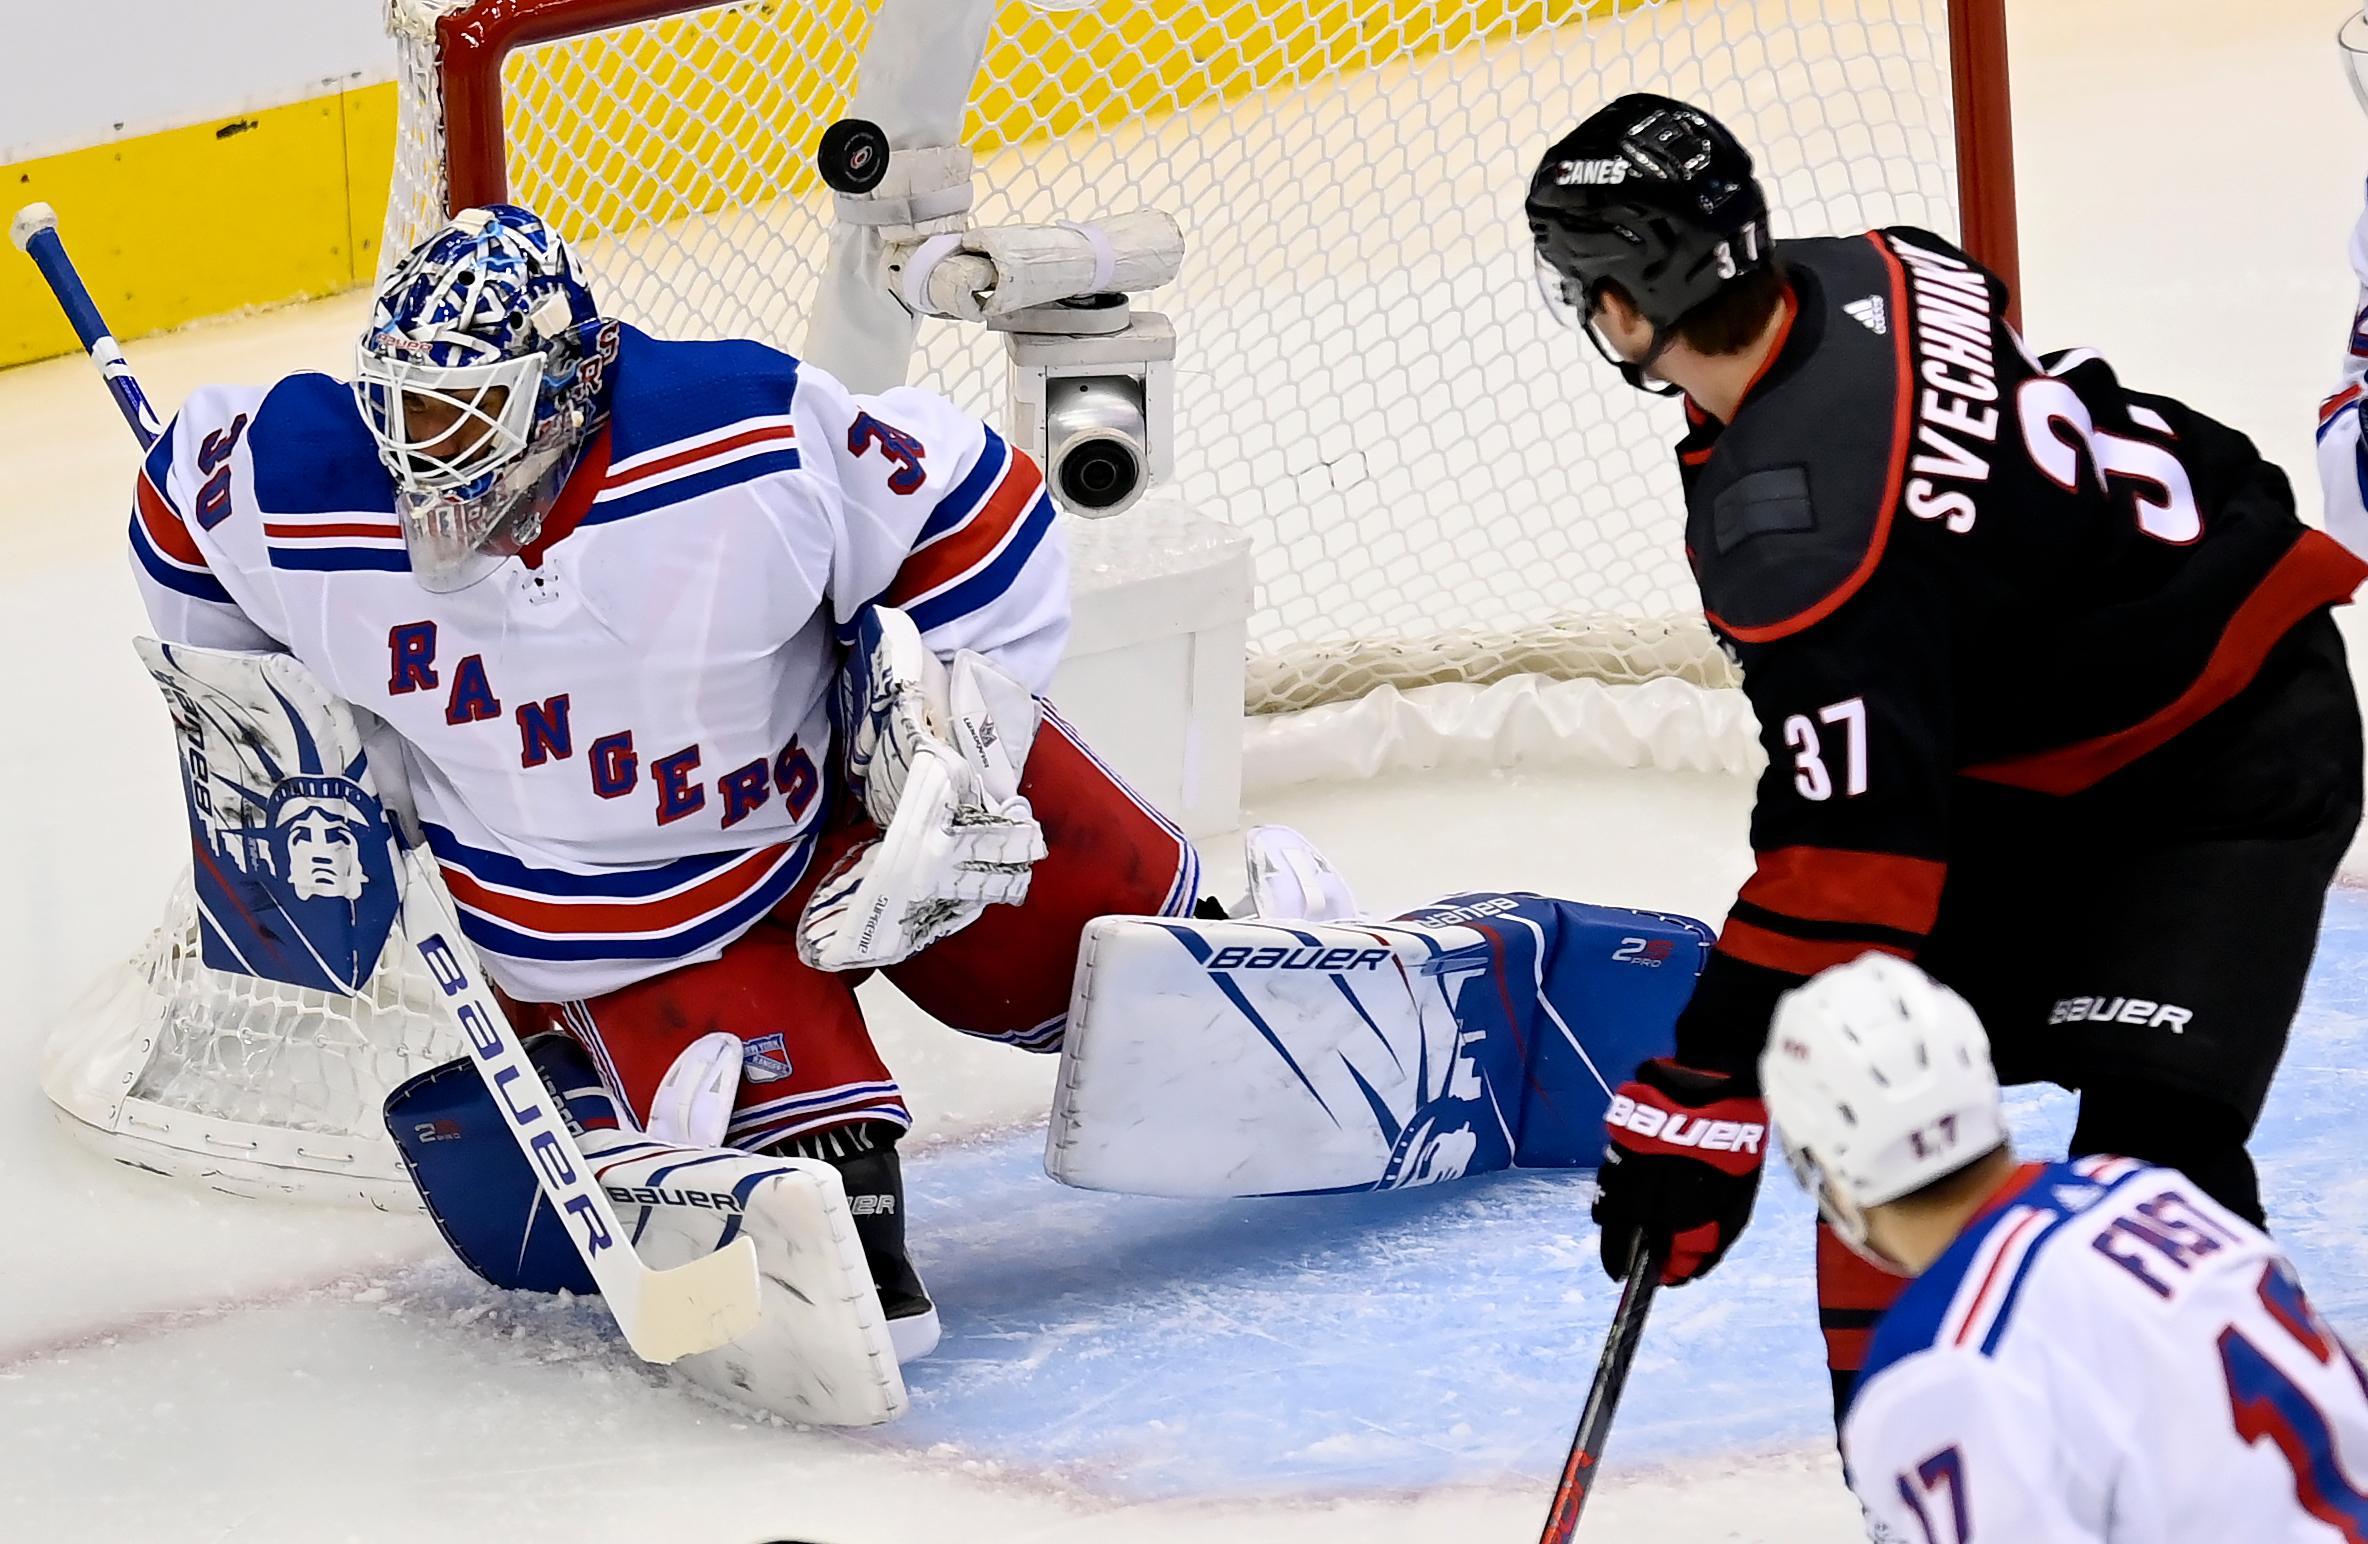 Rangers föll trots Lundqvists storspel